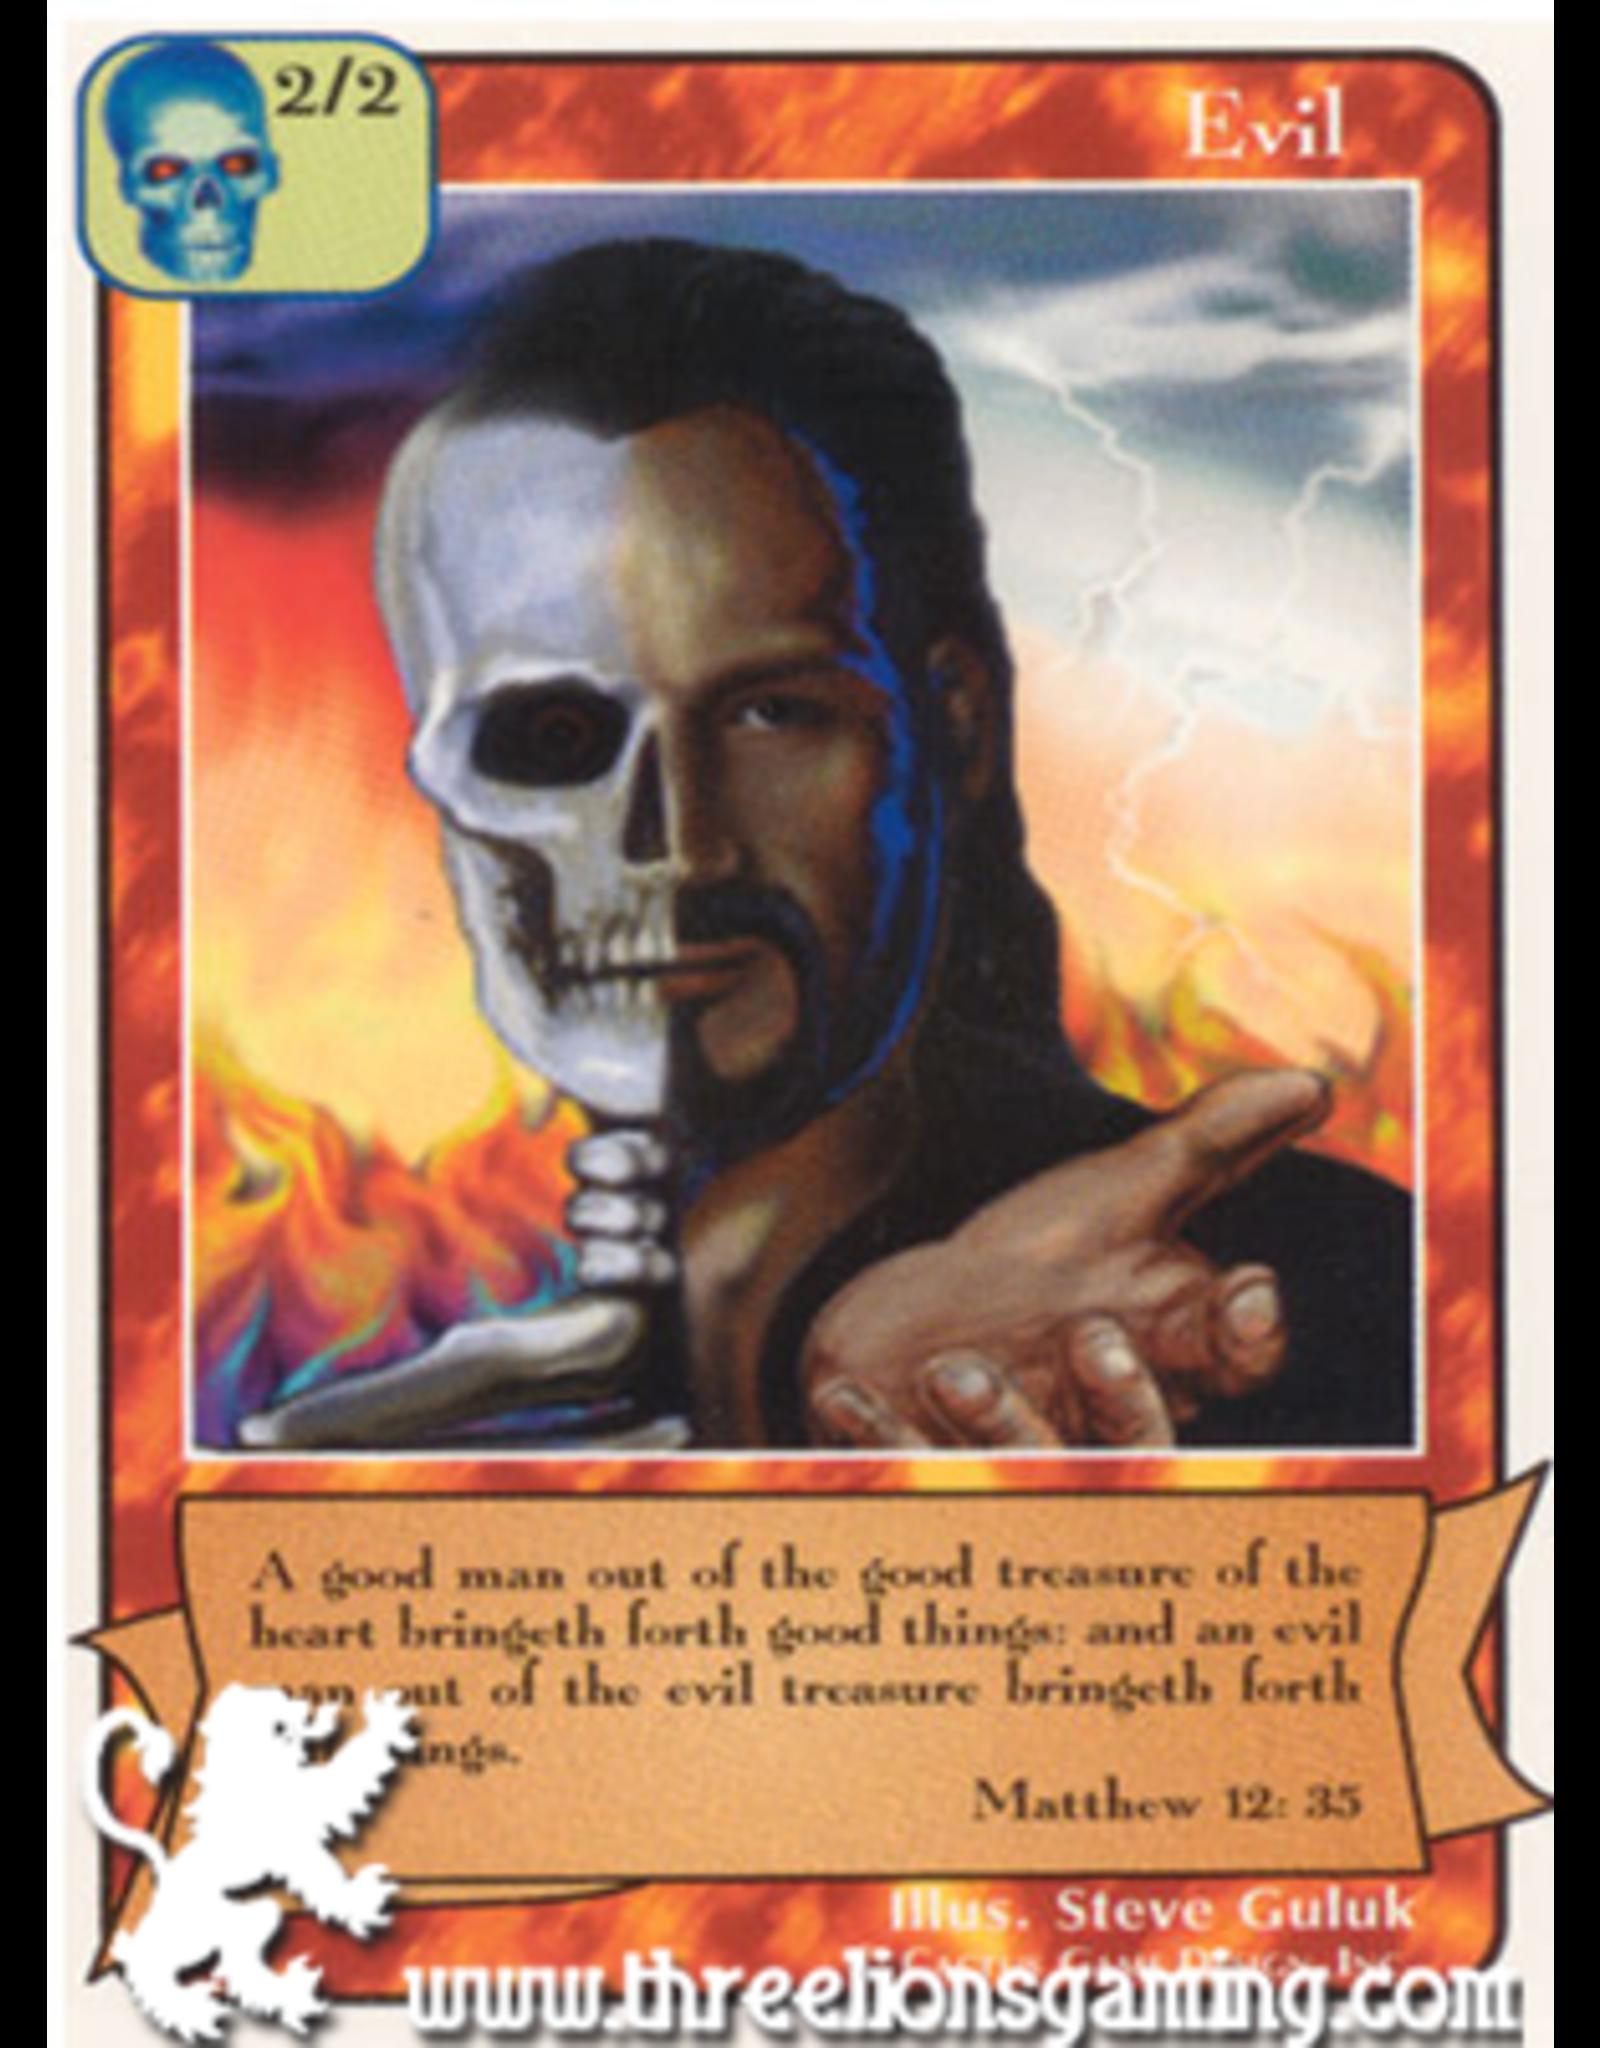 Orig: Evil